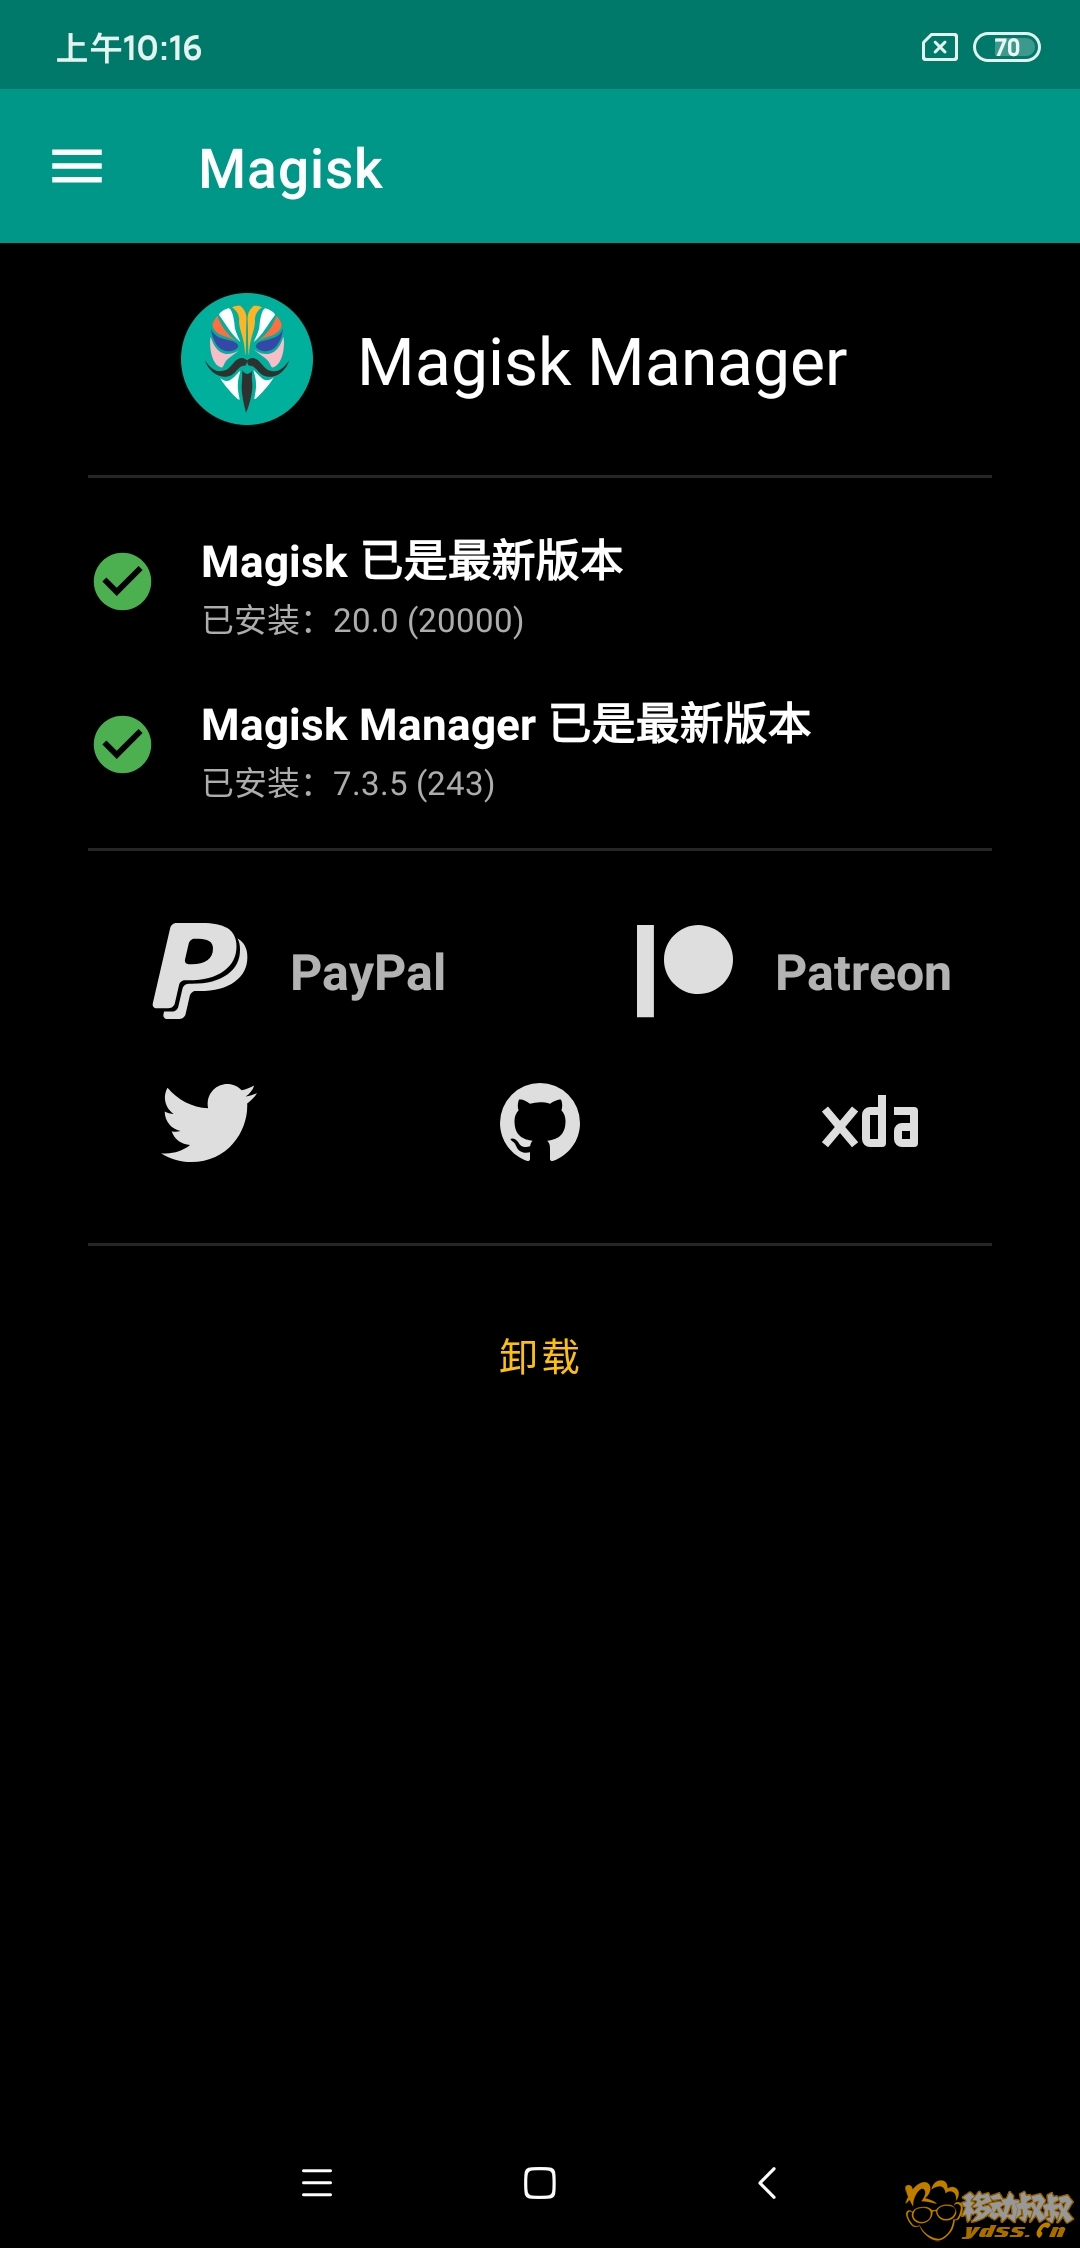 Screenshot_2019-10-12-10-16-33-303_com.topjohnwu.magisk.jpg